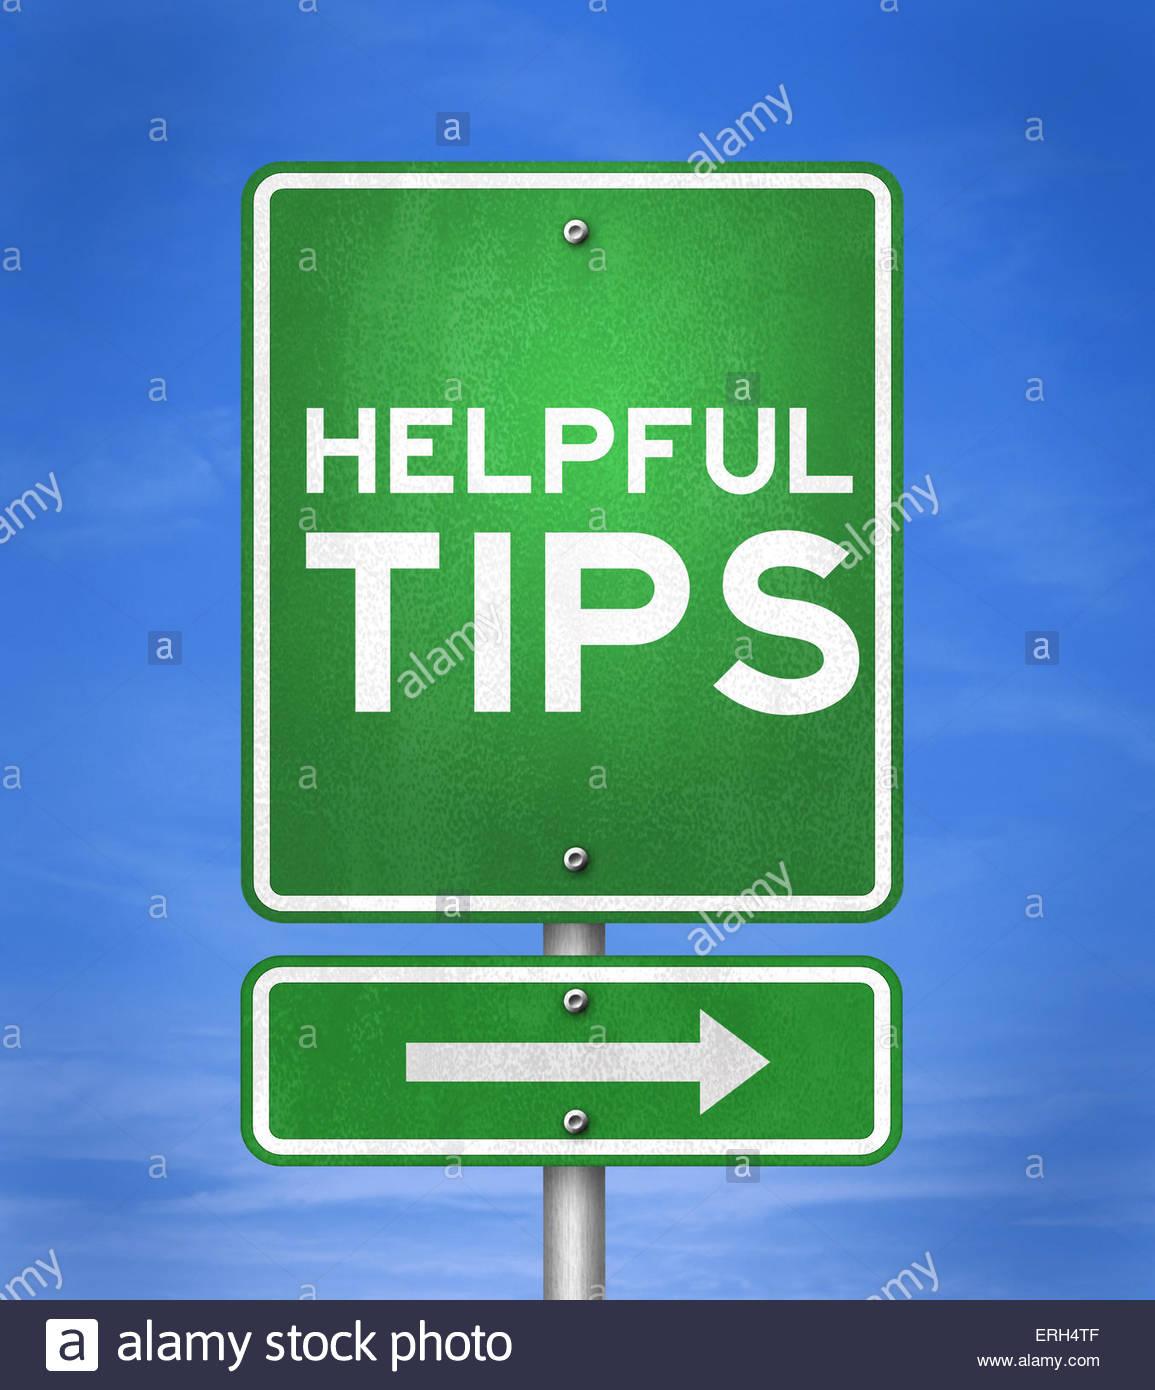 Conseils utiles - panneau routier concept Photo Stock